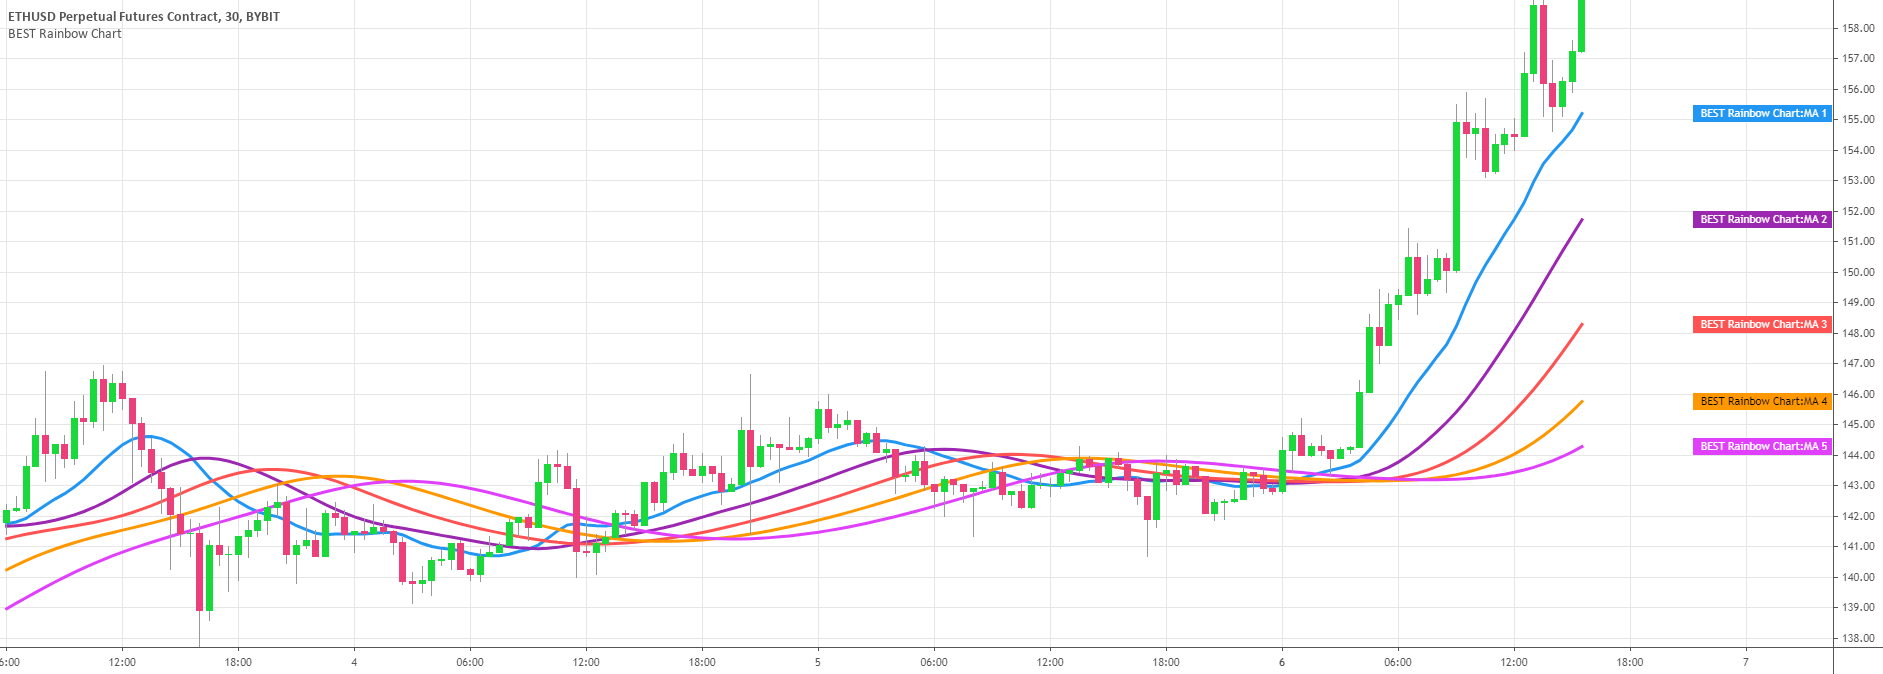 BEST Rainbow Chart — Indicator by Daveatt — TradingView